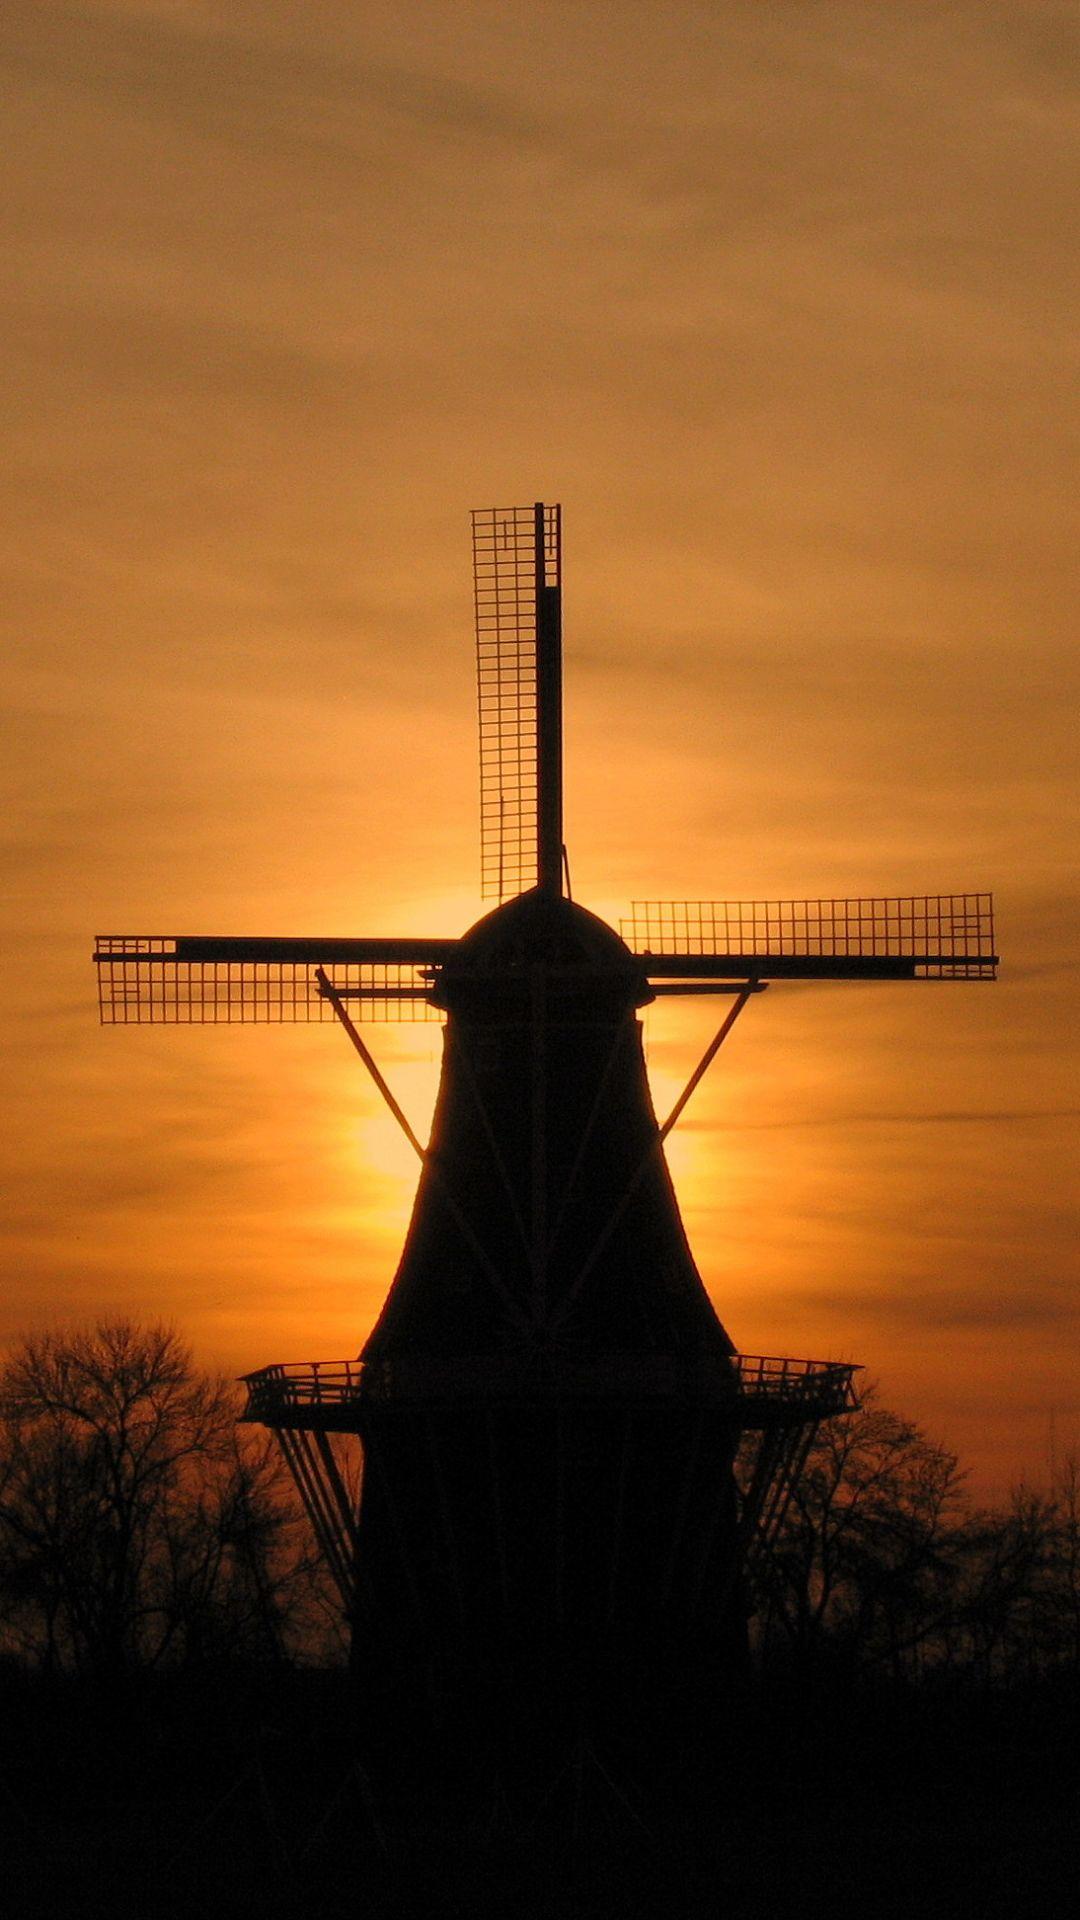 Man Made Windmill 1080x1920 Mobile Wallpaper Windmill Wallpaper Sun Panels